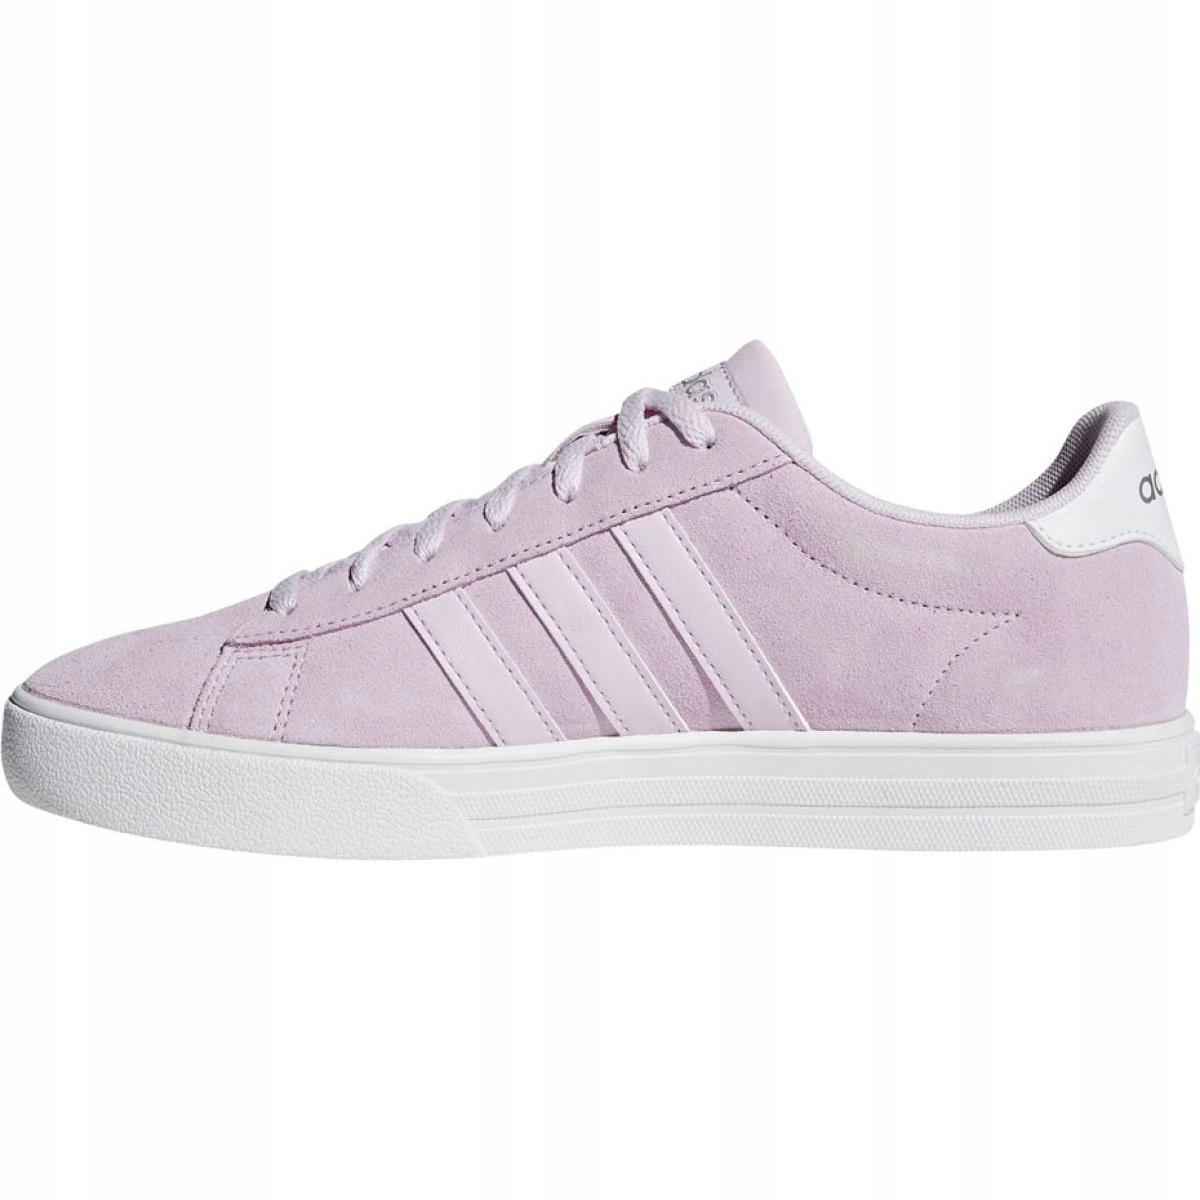 acheter en ligne e189a 6610a Rose Chaussures femme adidas Daily 2.0 W F34740